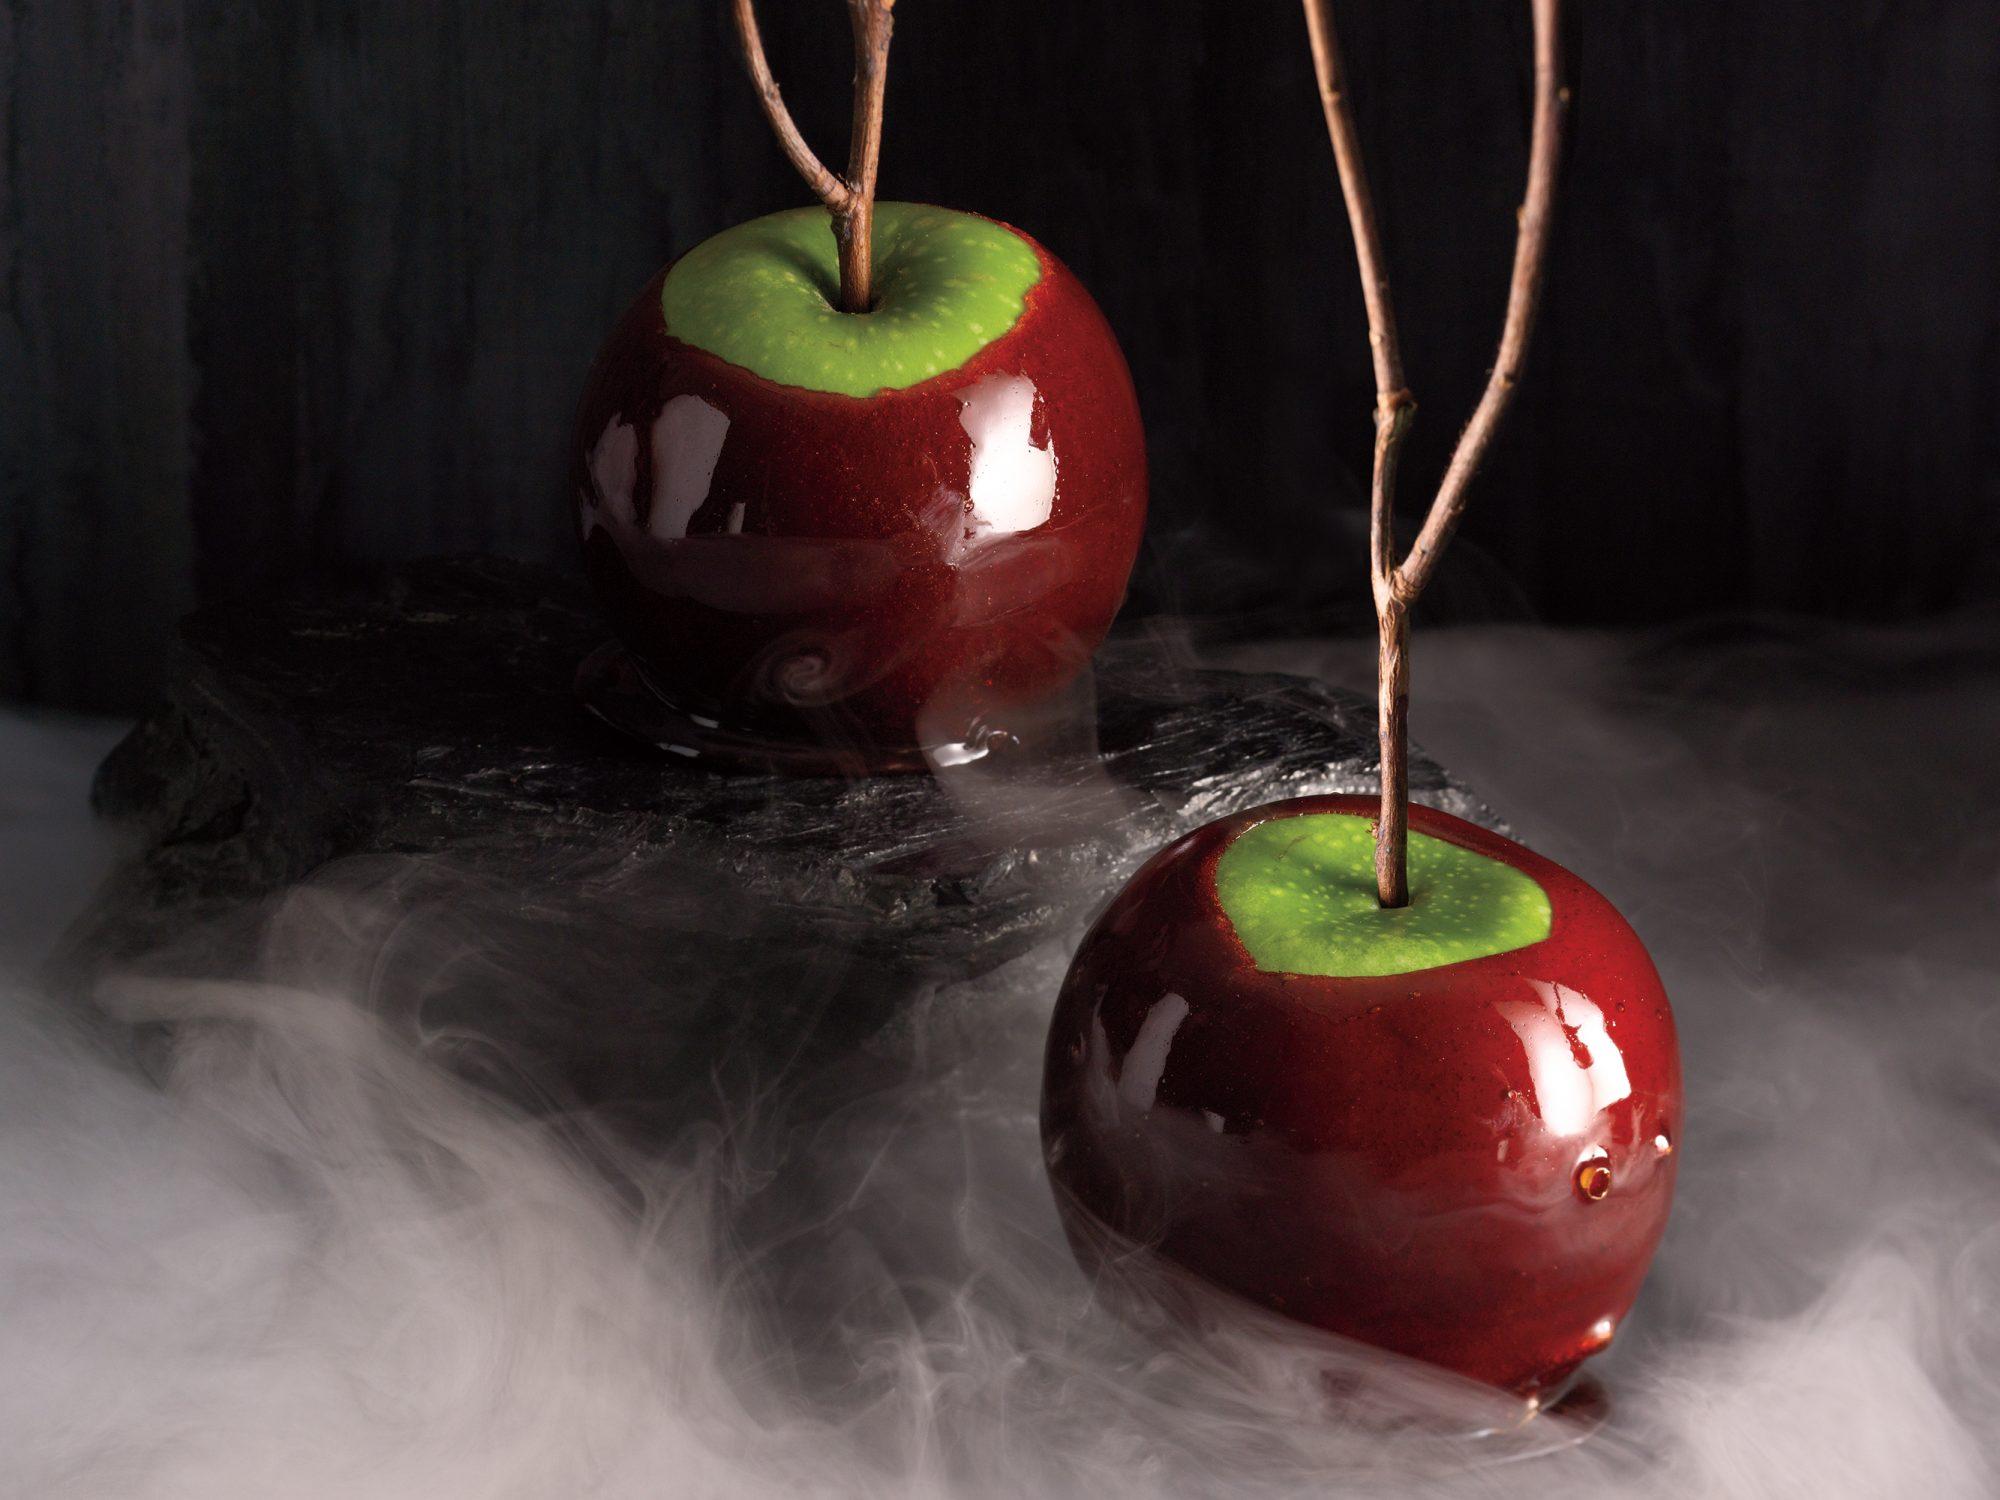 cinnamon-cider-candy-apple-ck-crop.jpg